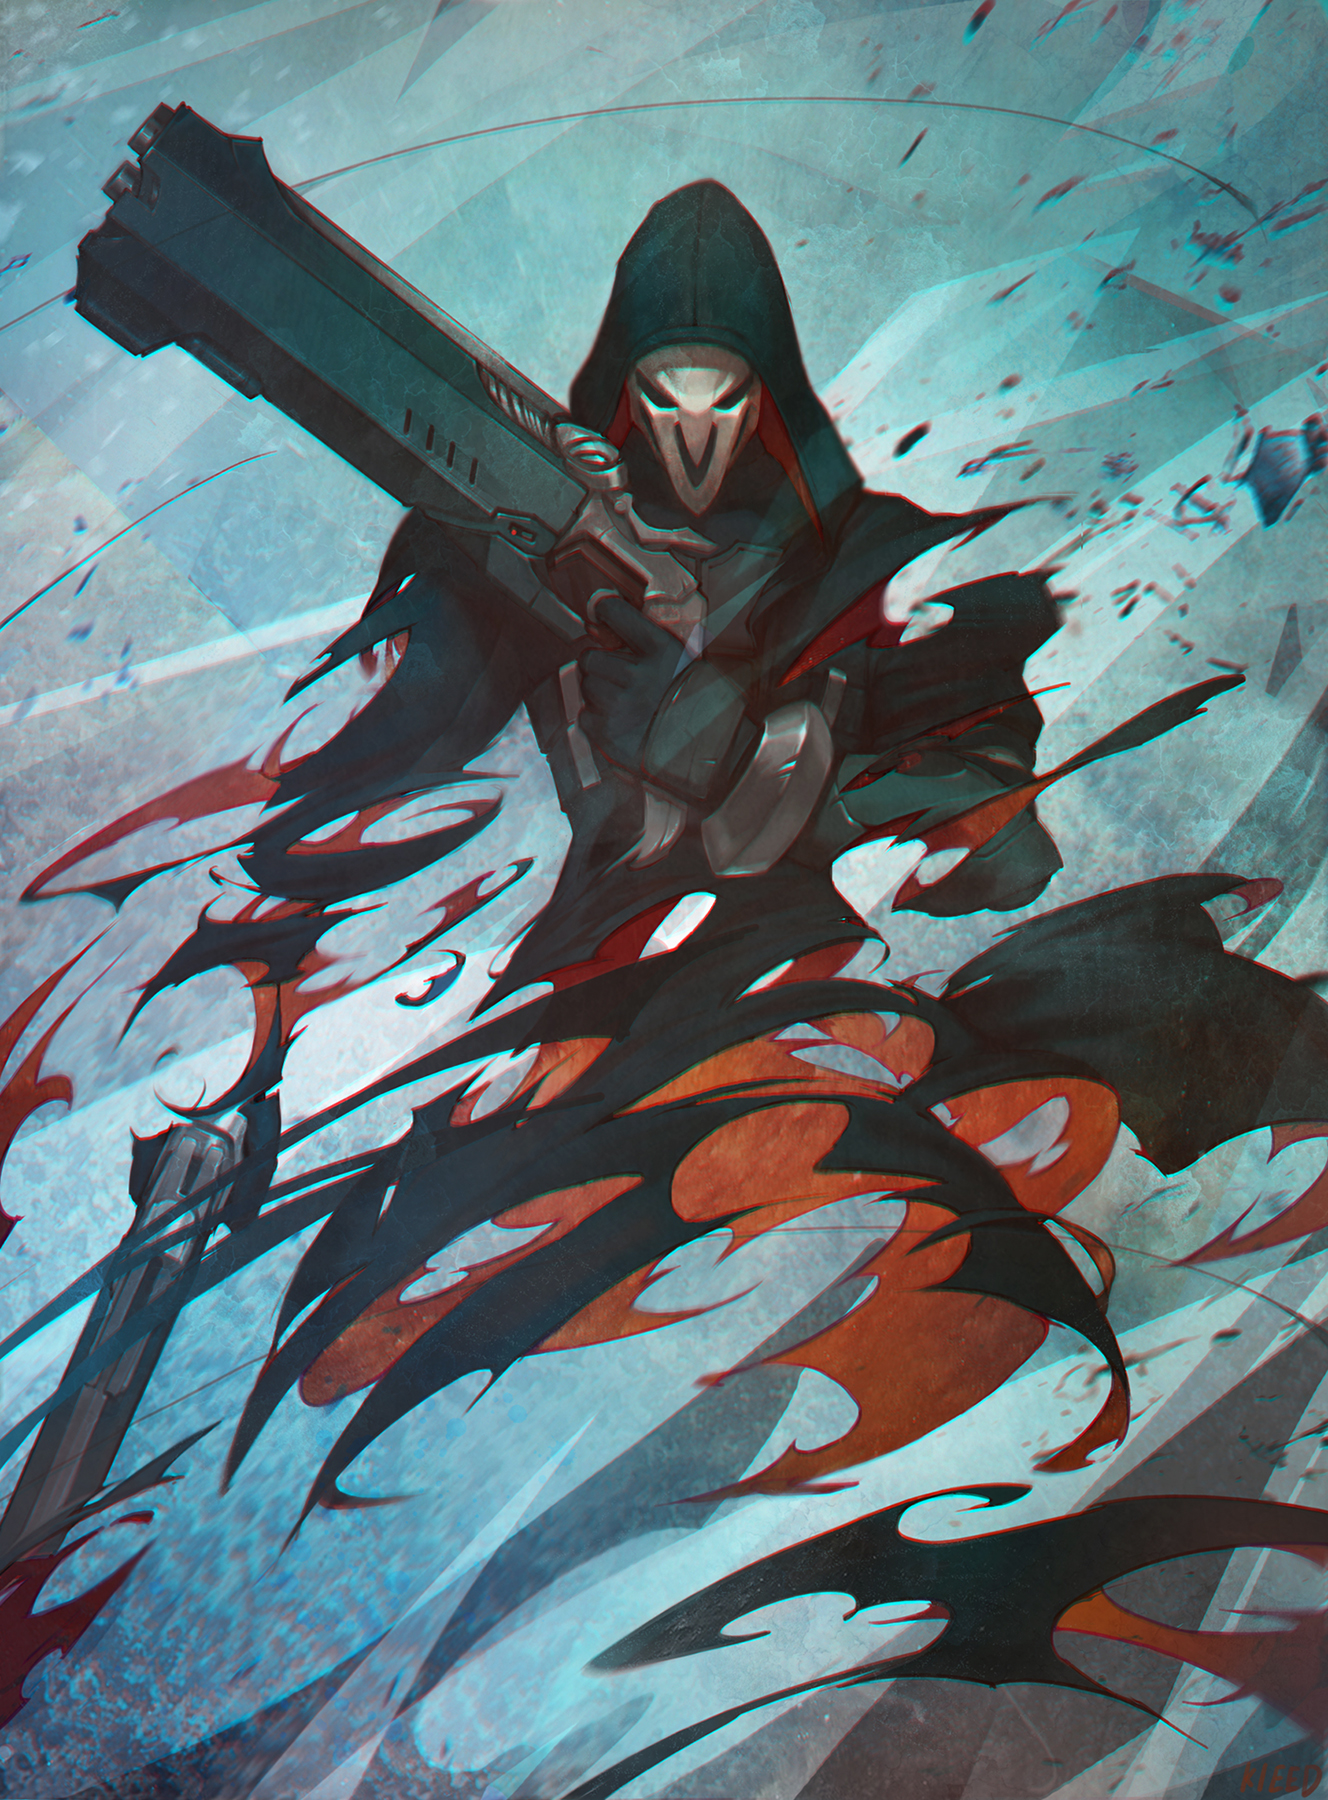 Reaper Overwatch Mobile Wallpaper Zerochan Anime Image